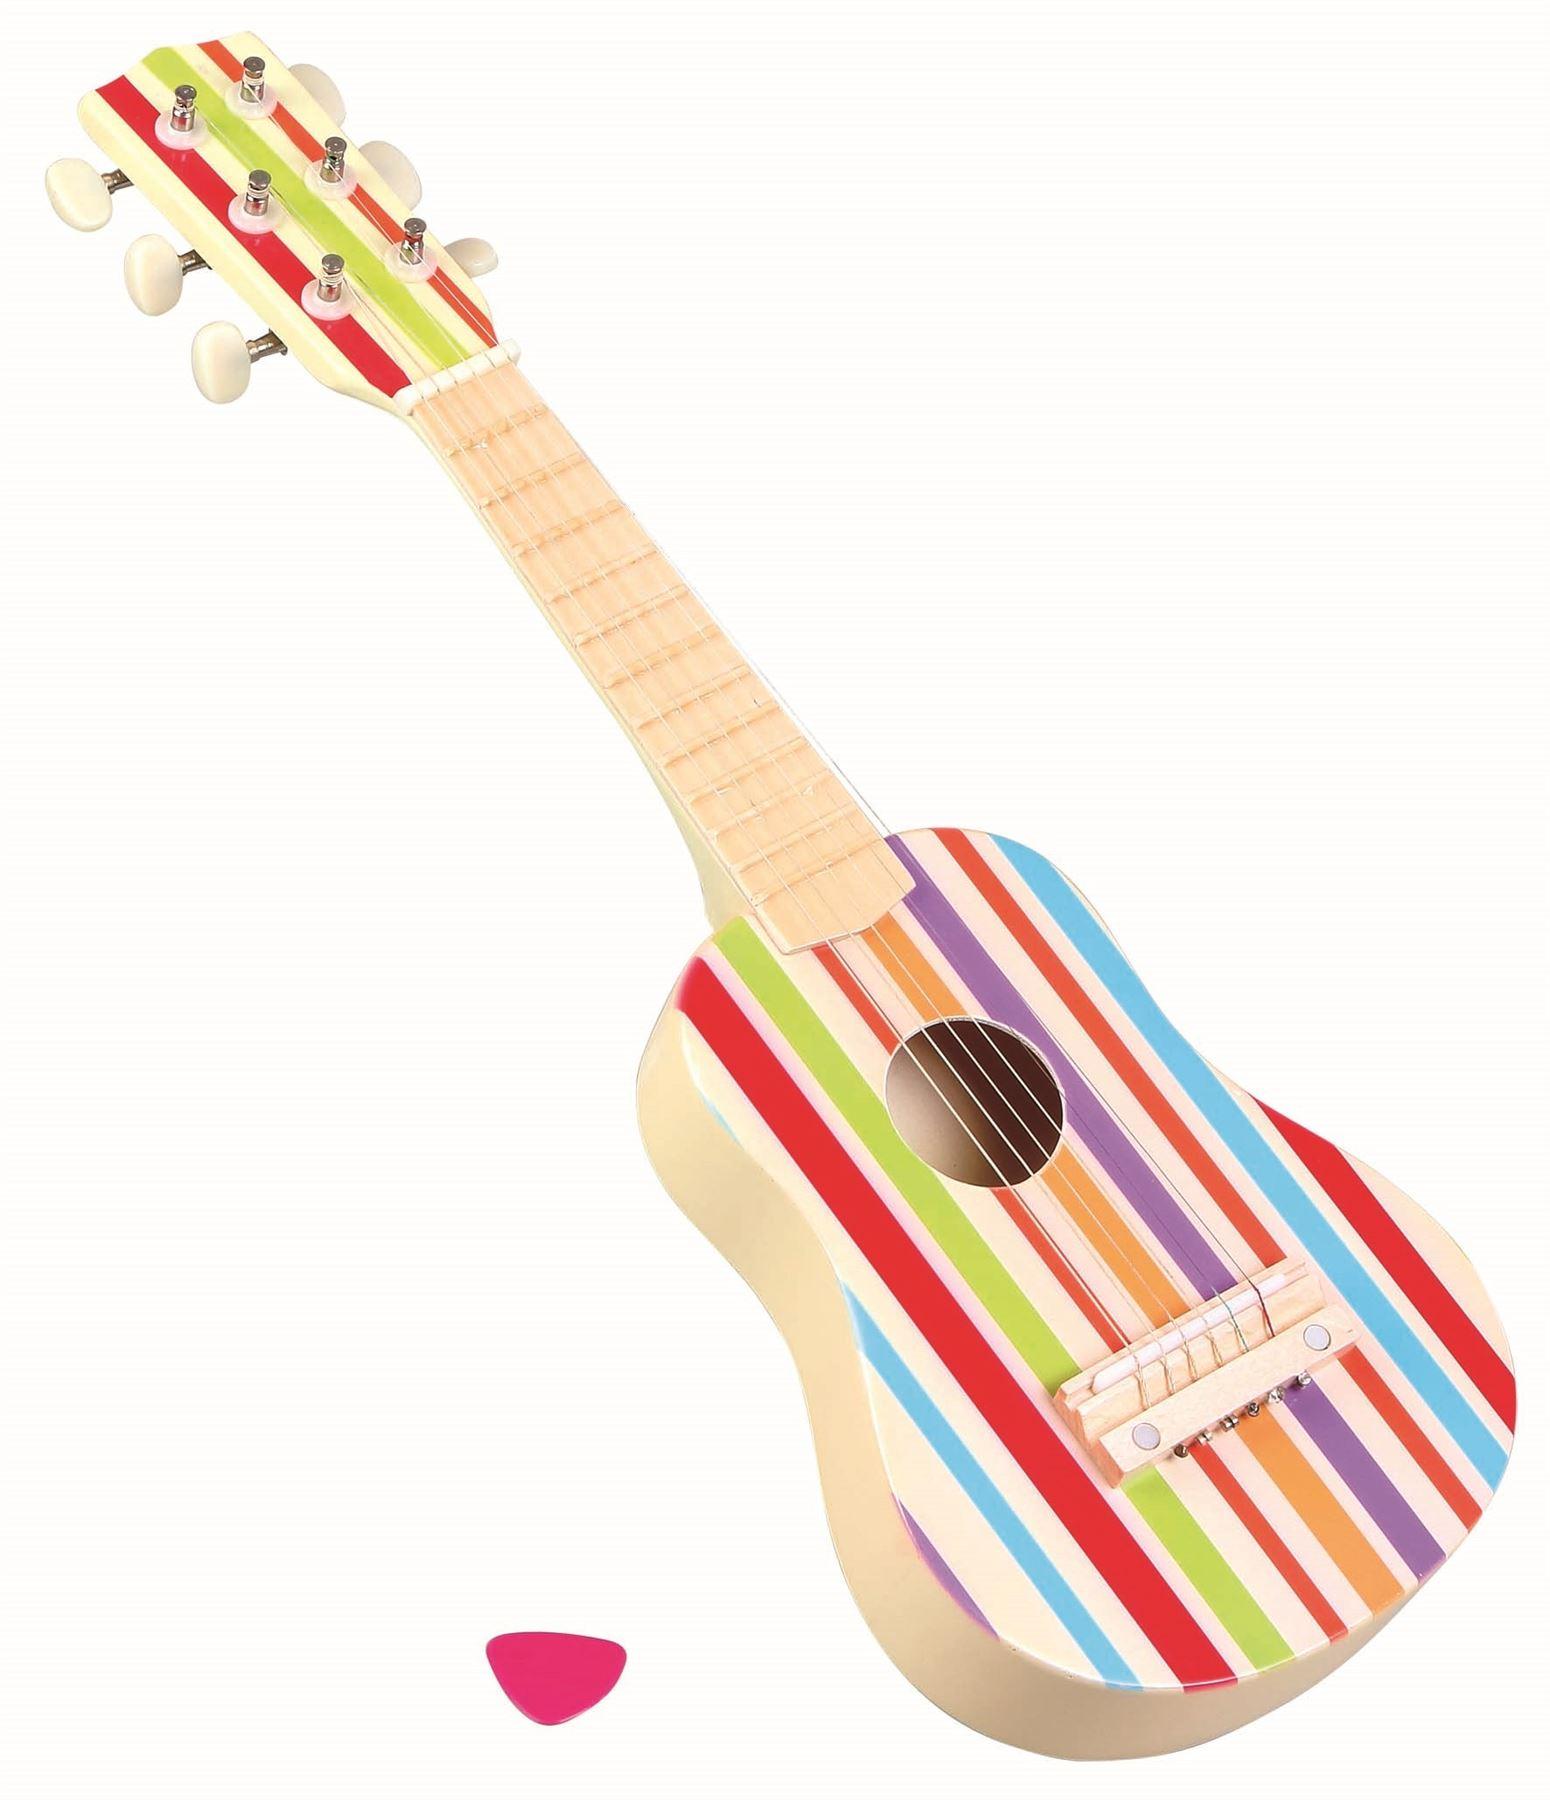 LELIN WOODEN STRIPE STRIPED BLUE PIRATE GUITAR CHILDRENS KIDS MUSICAL INSTRUMENT